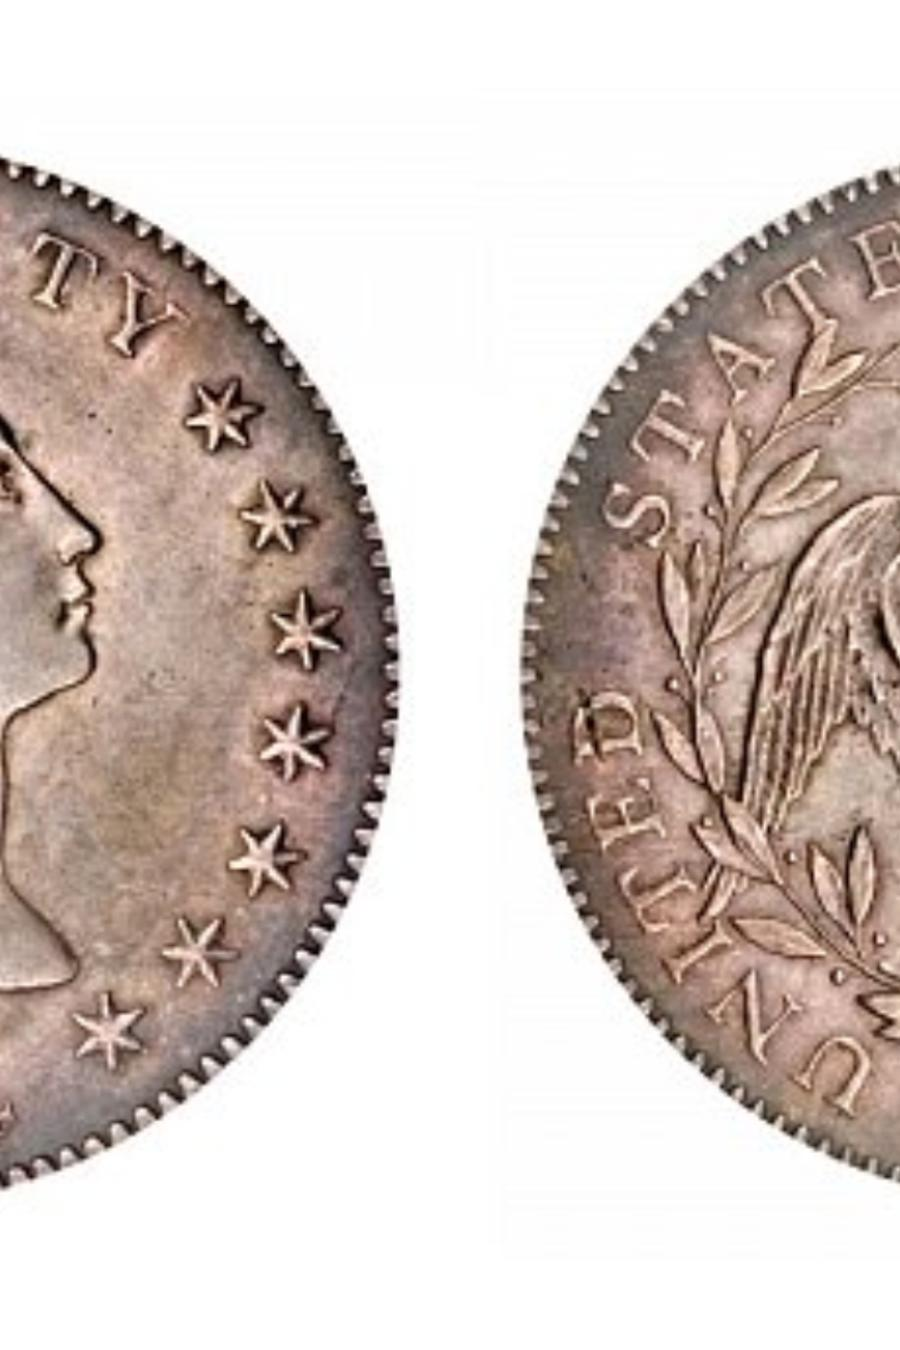 Moneda de plata de 1974